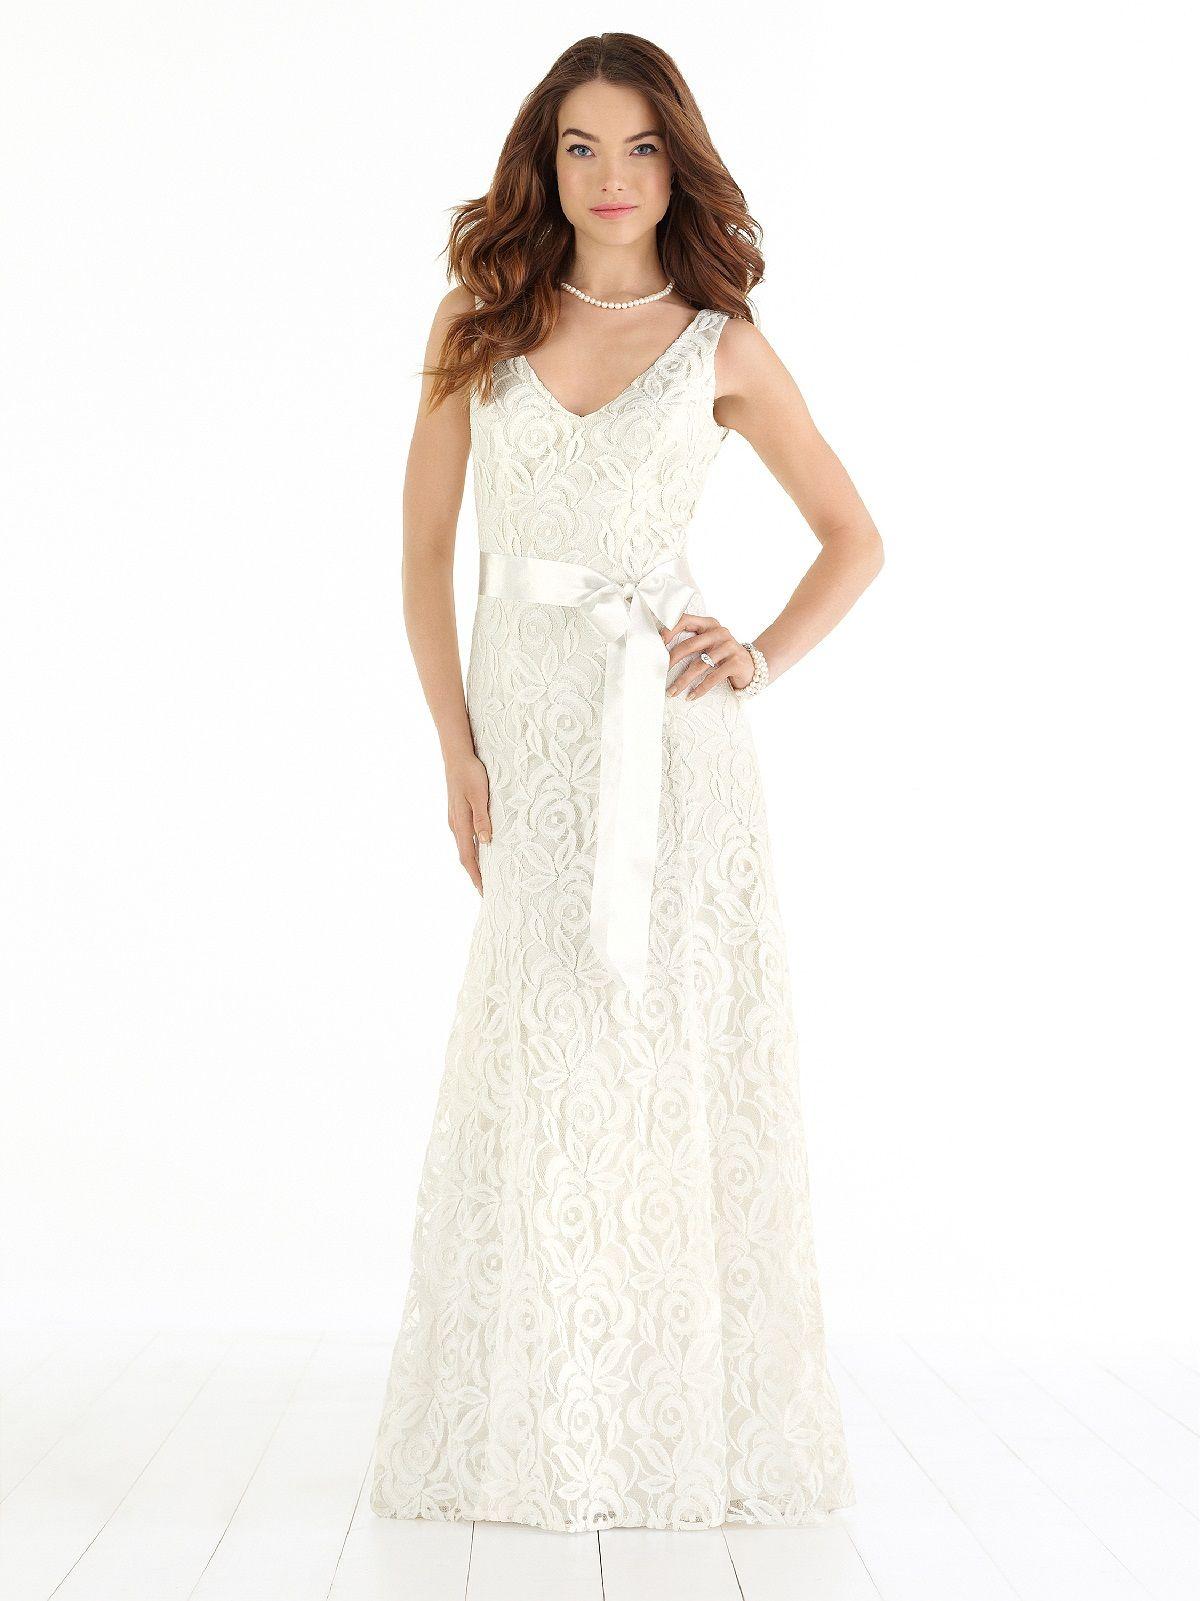 Wedding Photography Under 500: Full-length V-neck Lace Beach Wedding Dress Has Sweep